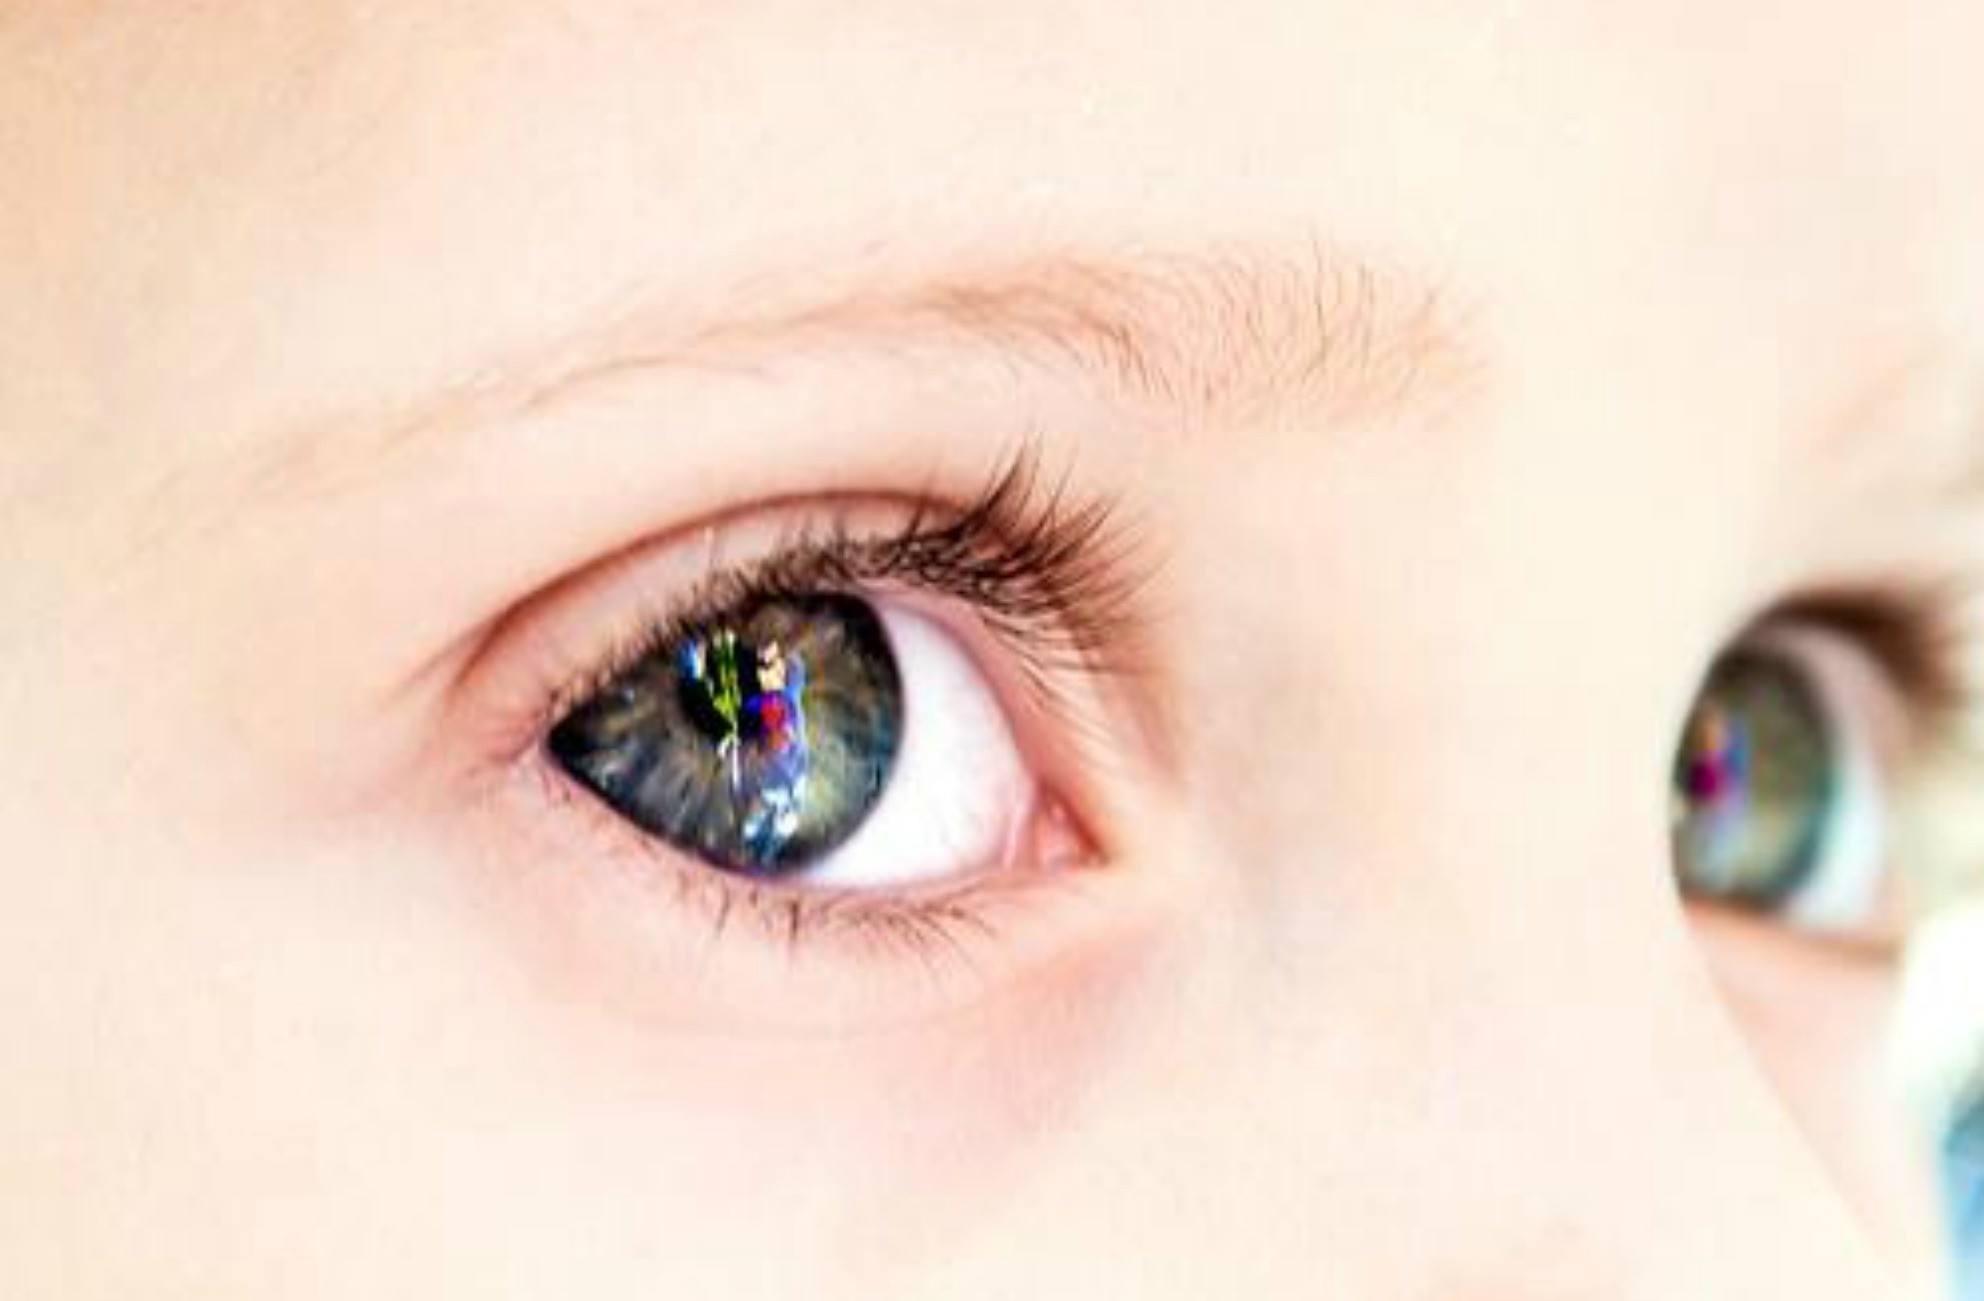 Malalties oculars freqüents en els nens